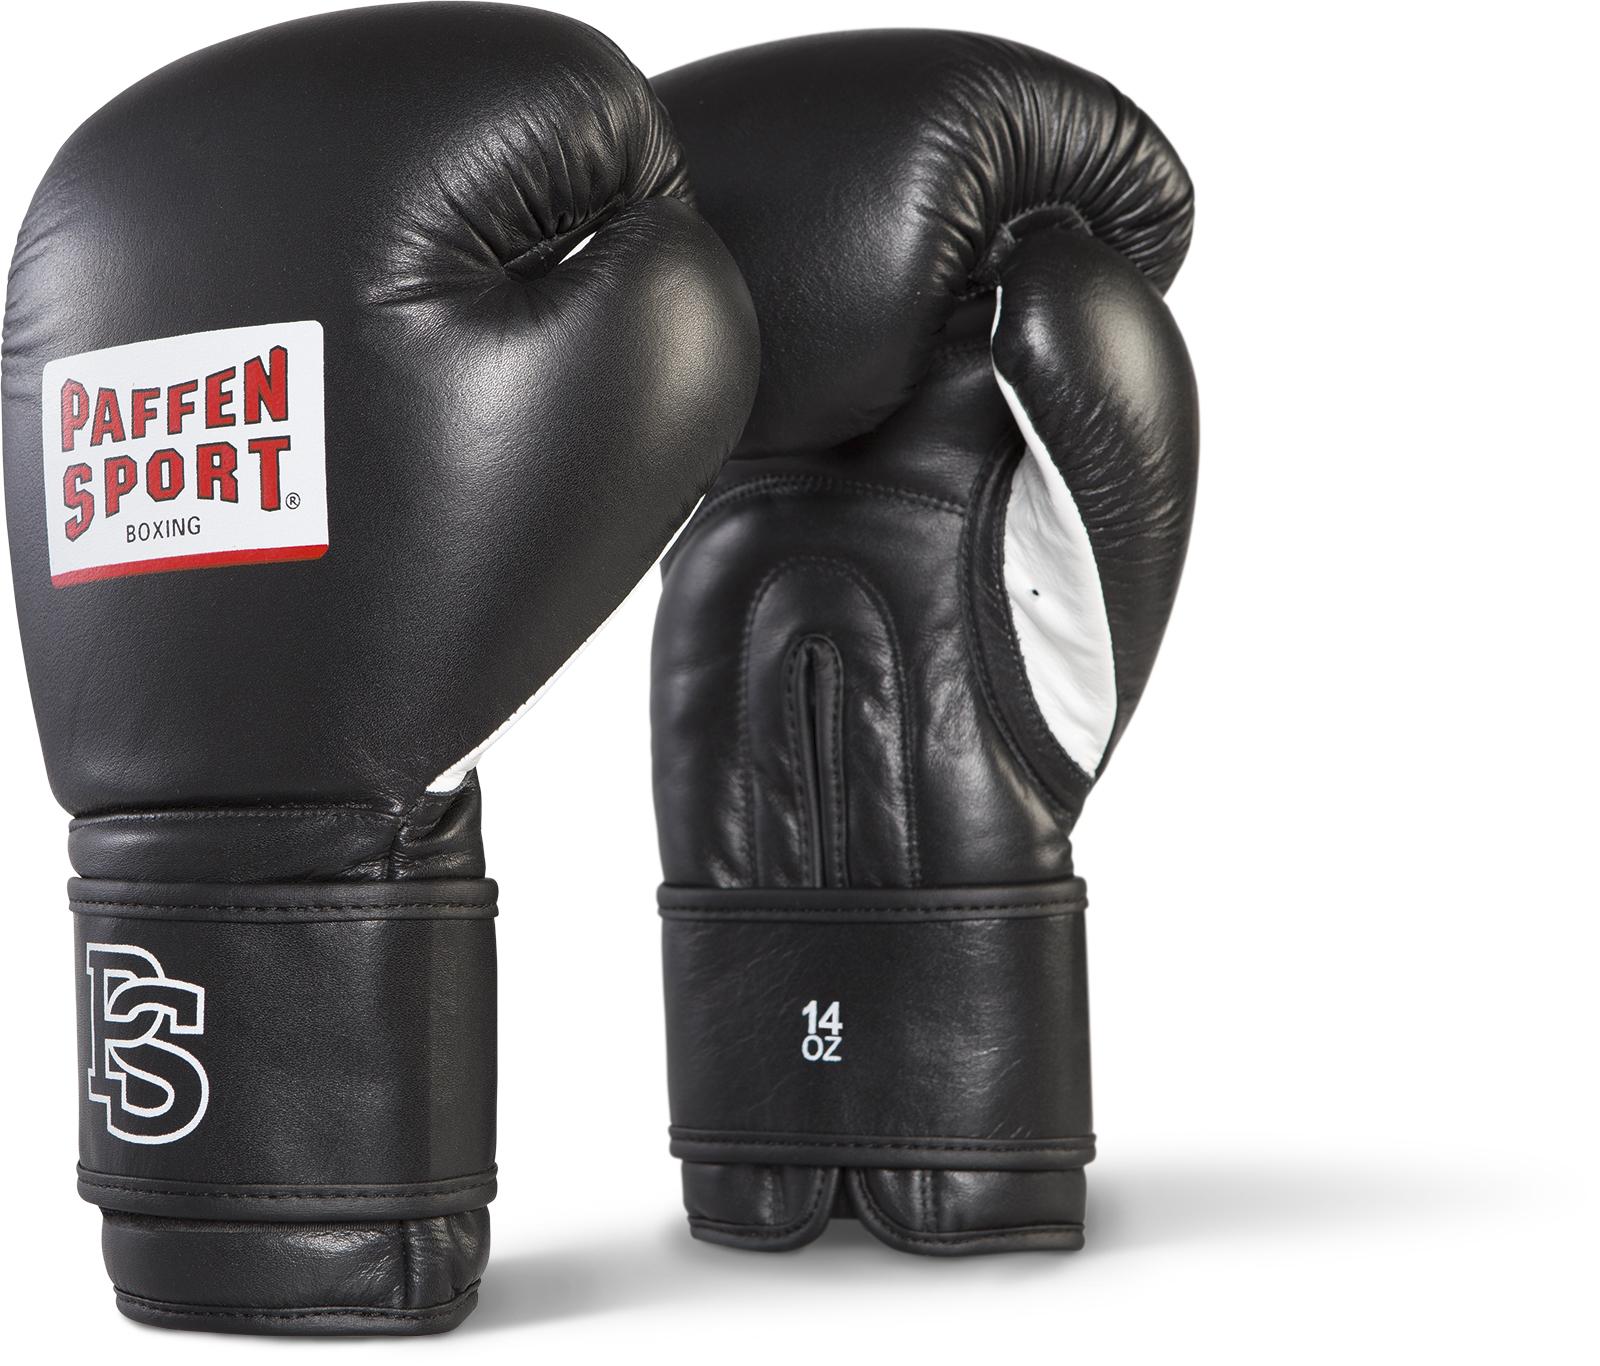 Paffen Sport Star III Bokshandschoenen - Zwart - 18oz